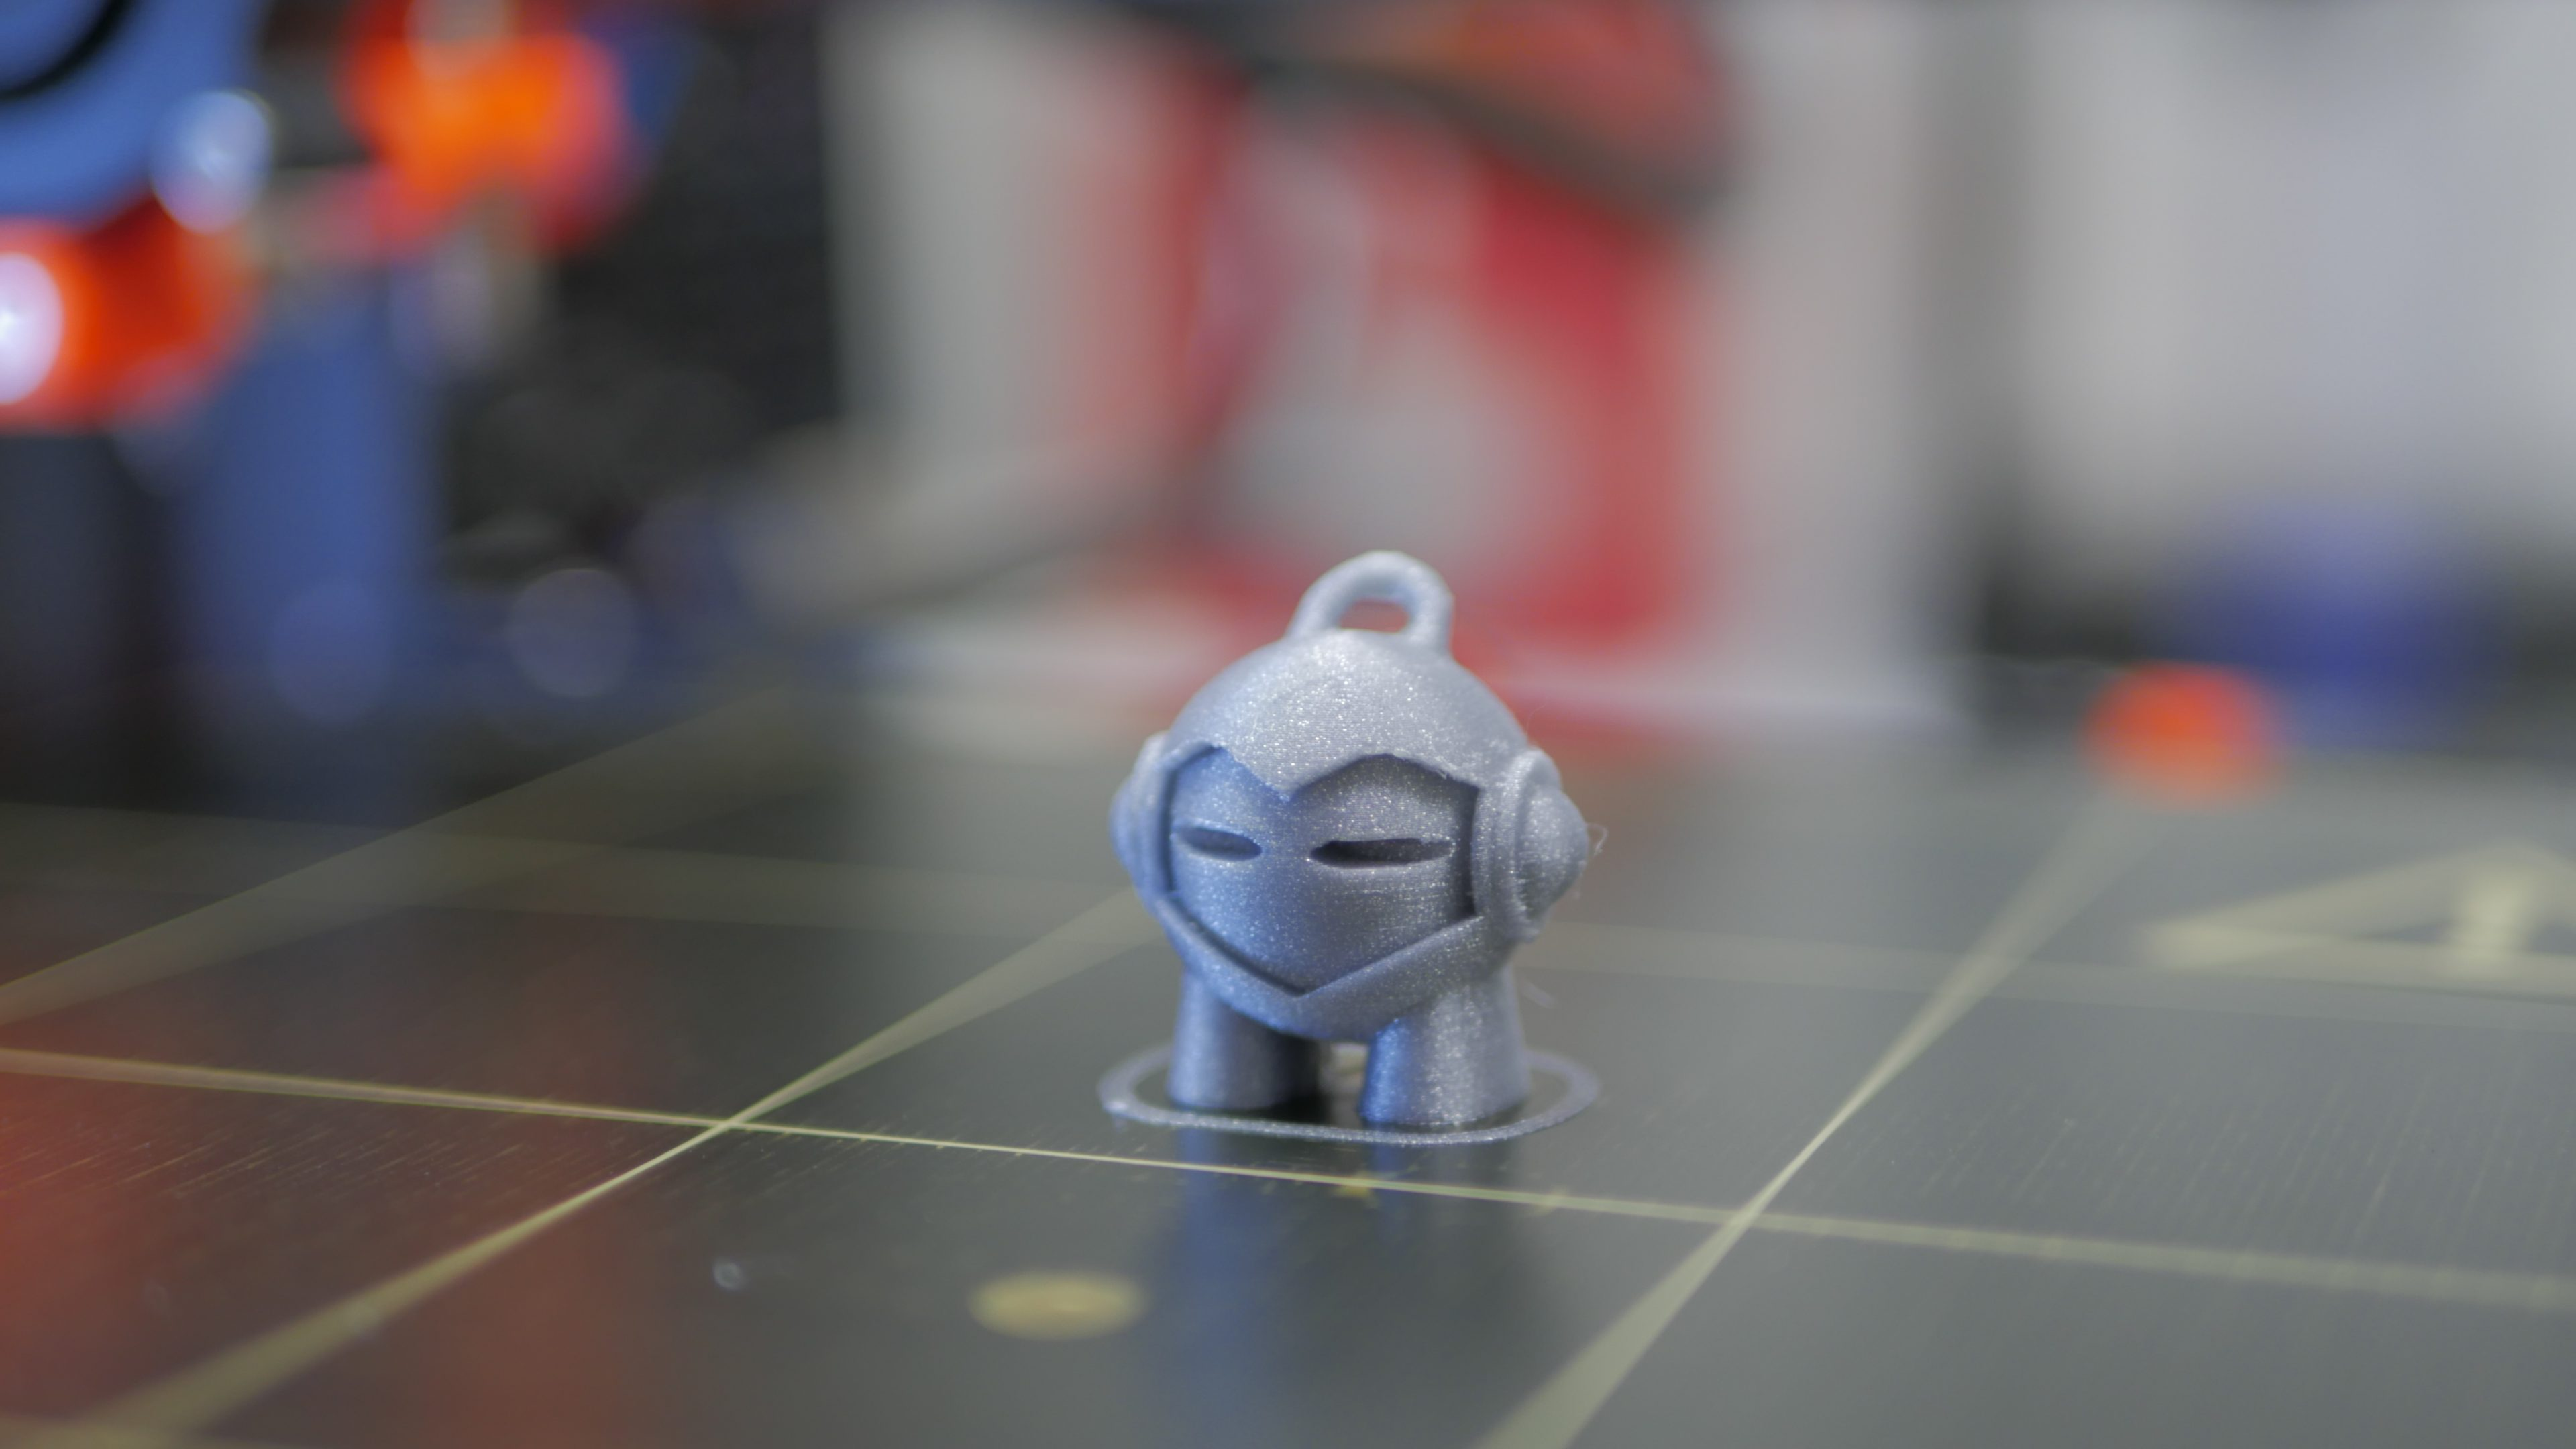 3DHubs Marvin